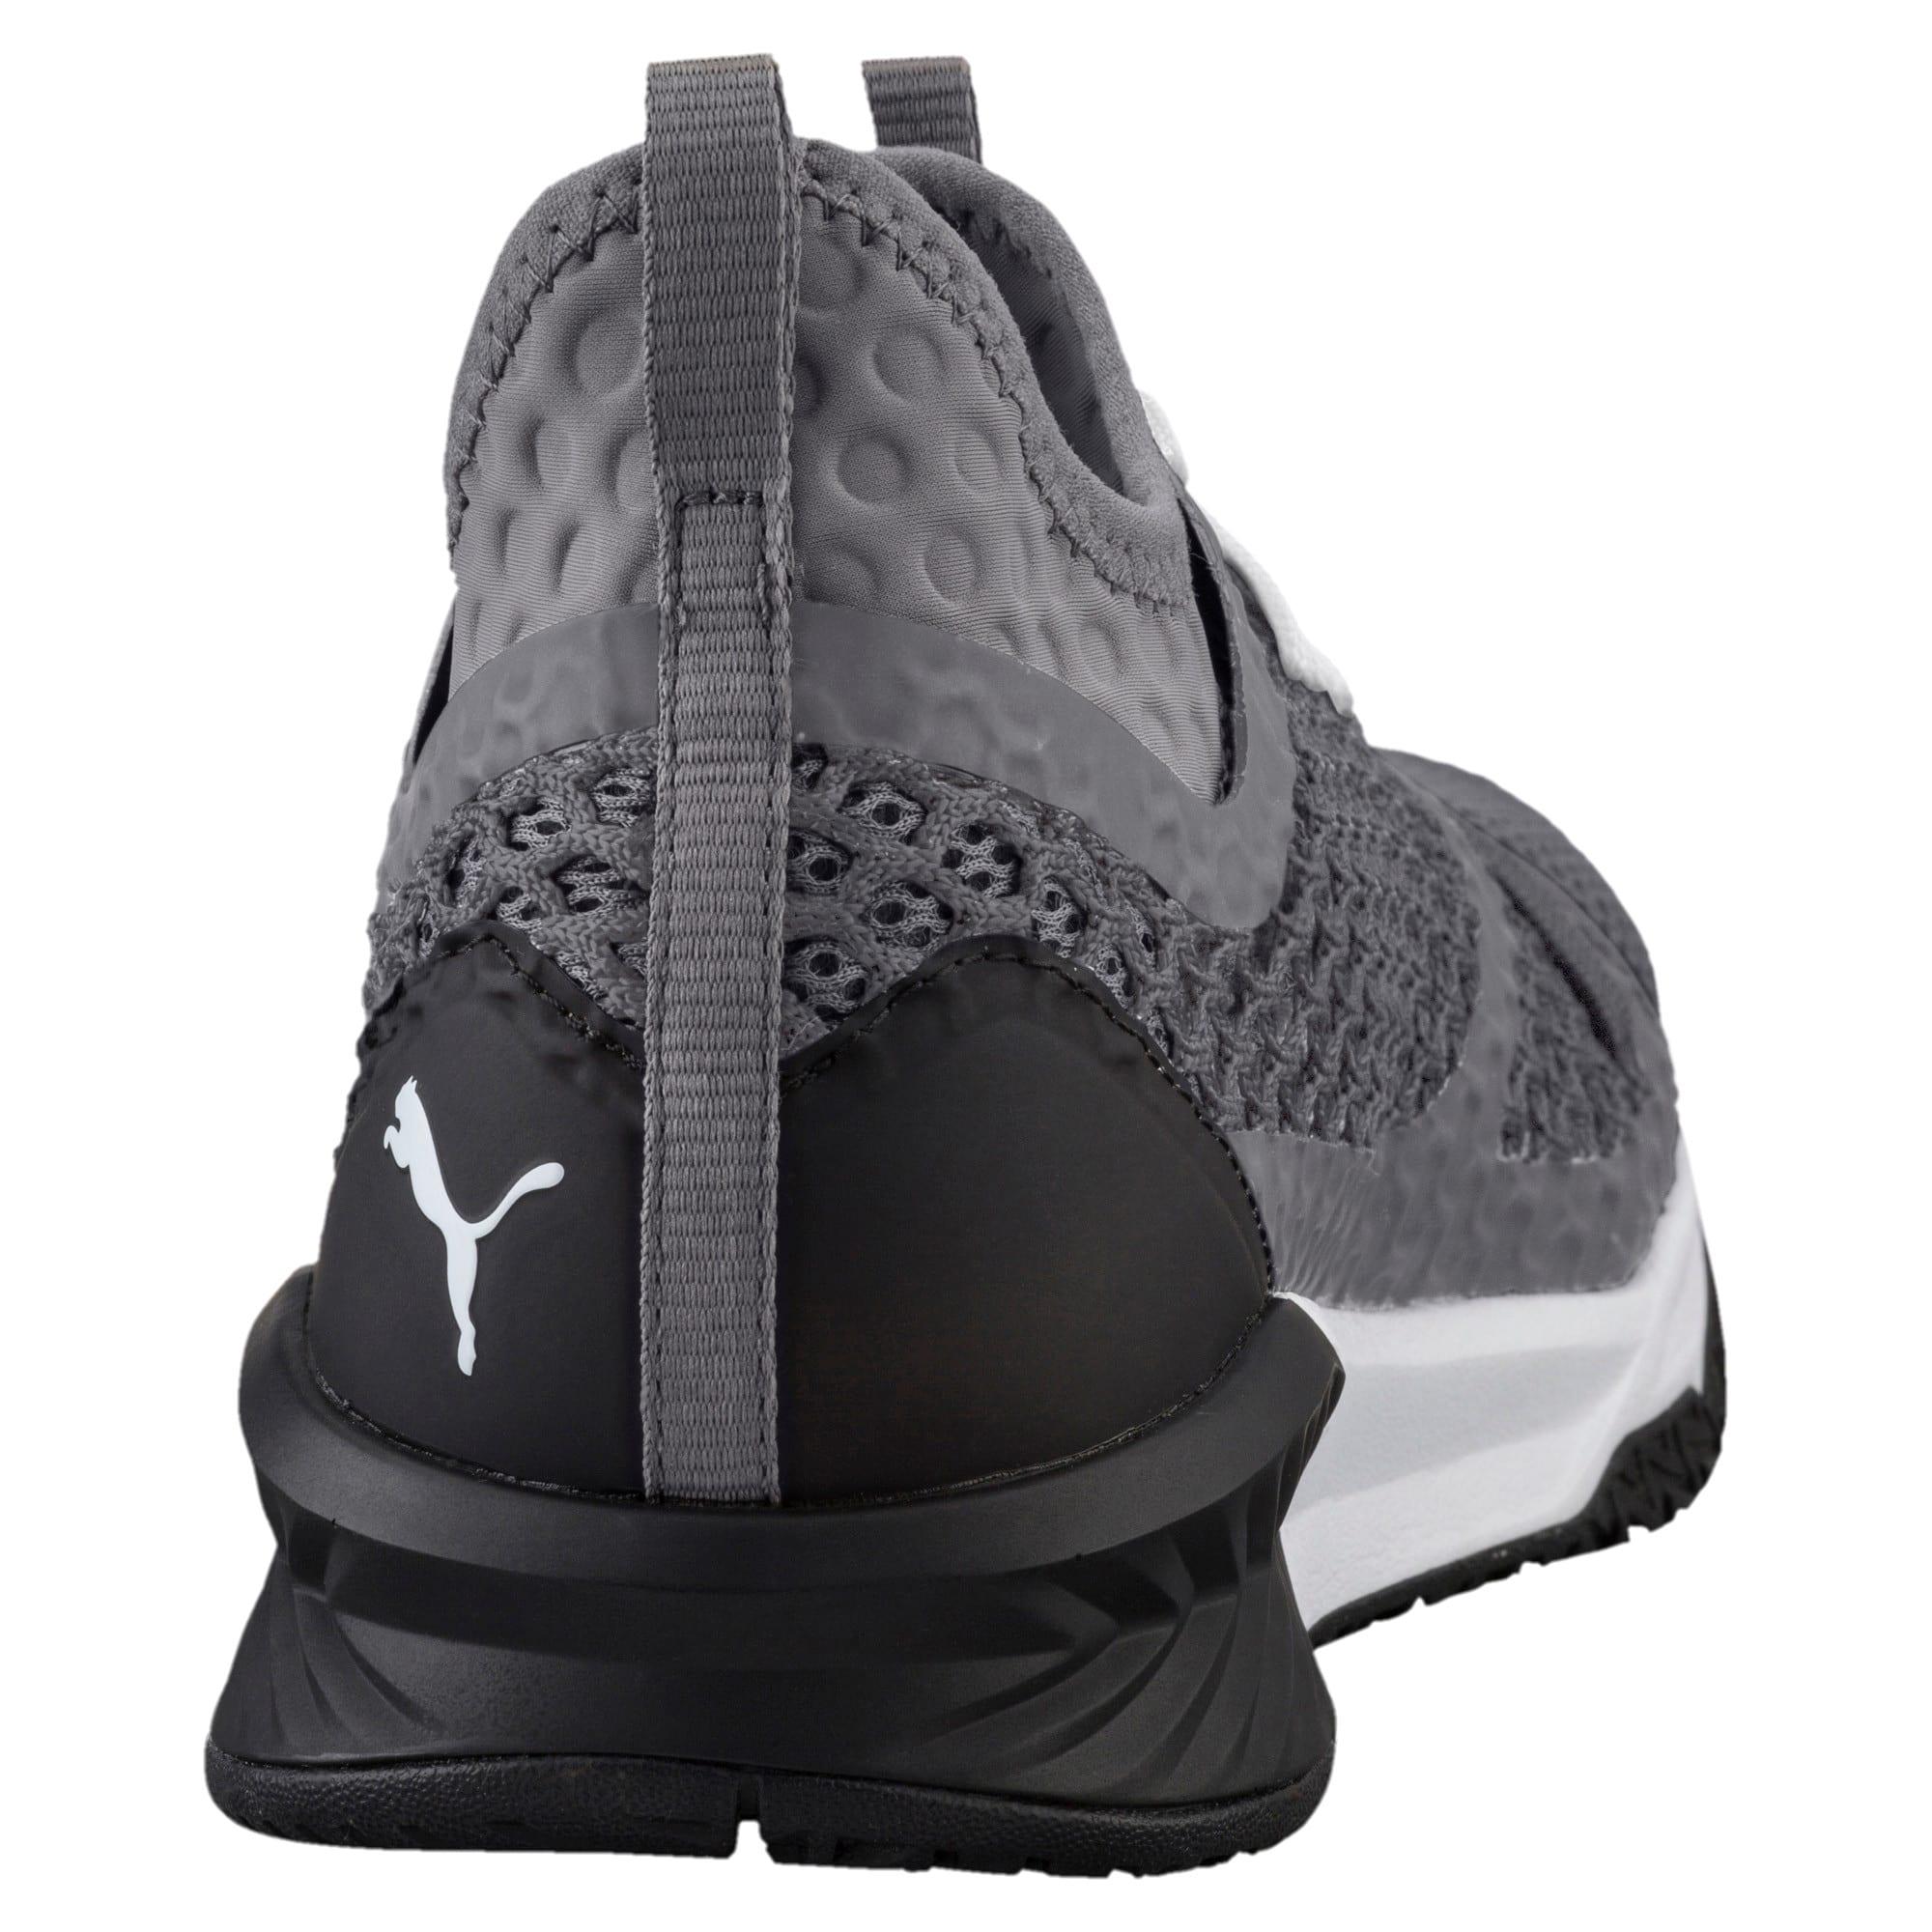 Thumbnail 4 of IGNITE XT NETFIT Men's Training Shoes, QUIET SHADE-Puma Black, medium-IND